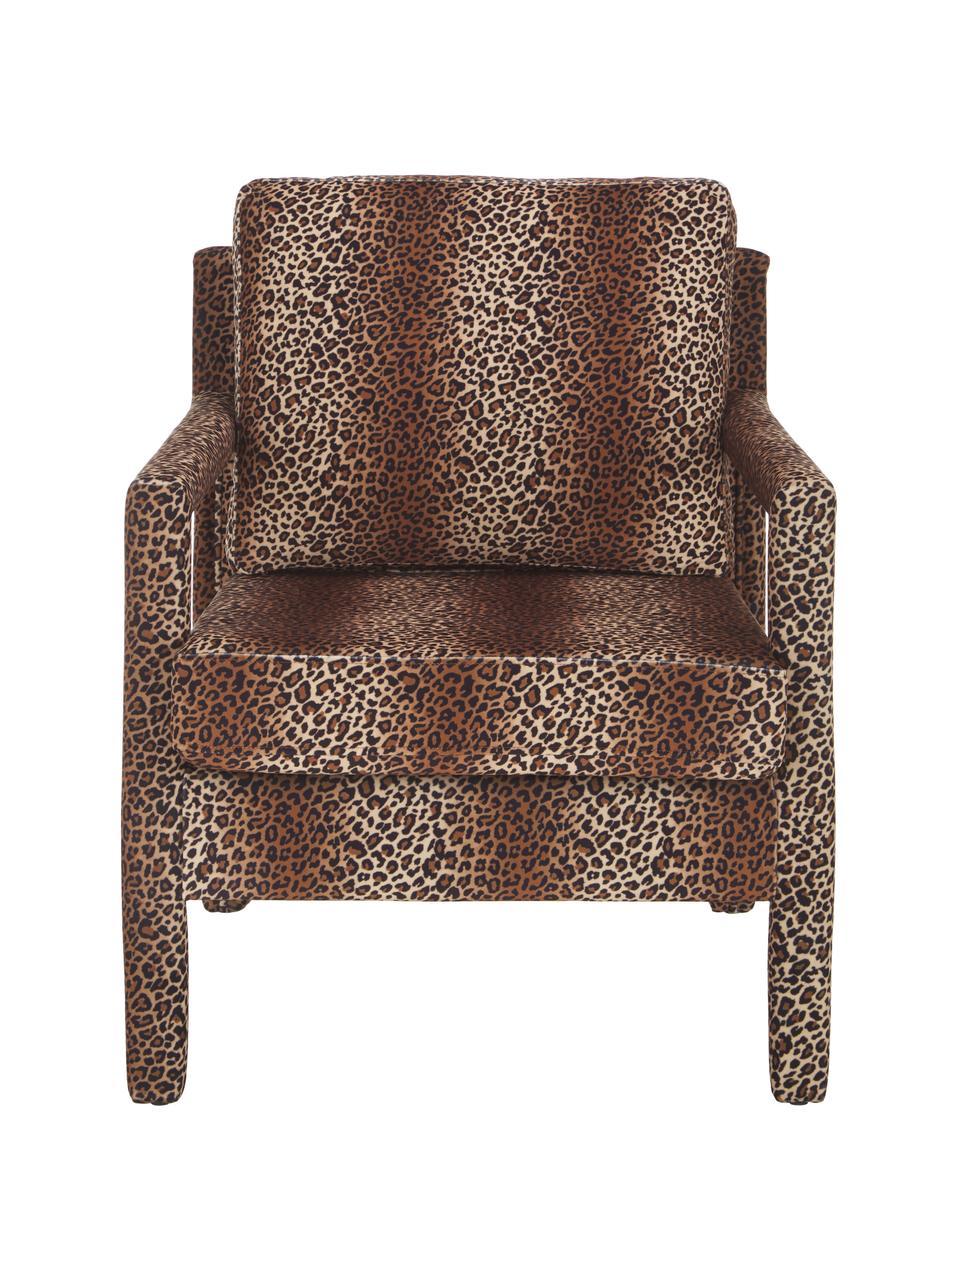 Fluwelen fauteuil Claudette met bruin luipaardpatroon, Bekleding: fluweel (100% polyester), Frame: massief grenenhout, multi, Bruin, zwart, 65 x 75 cm